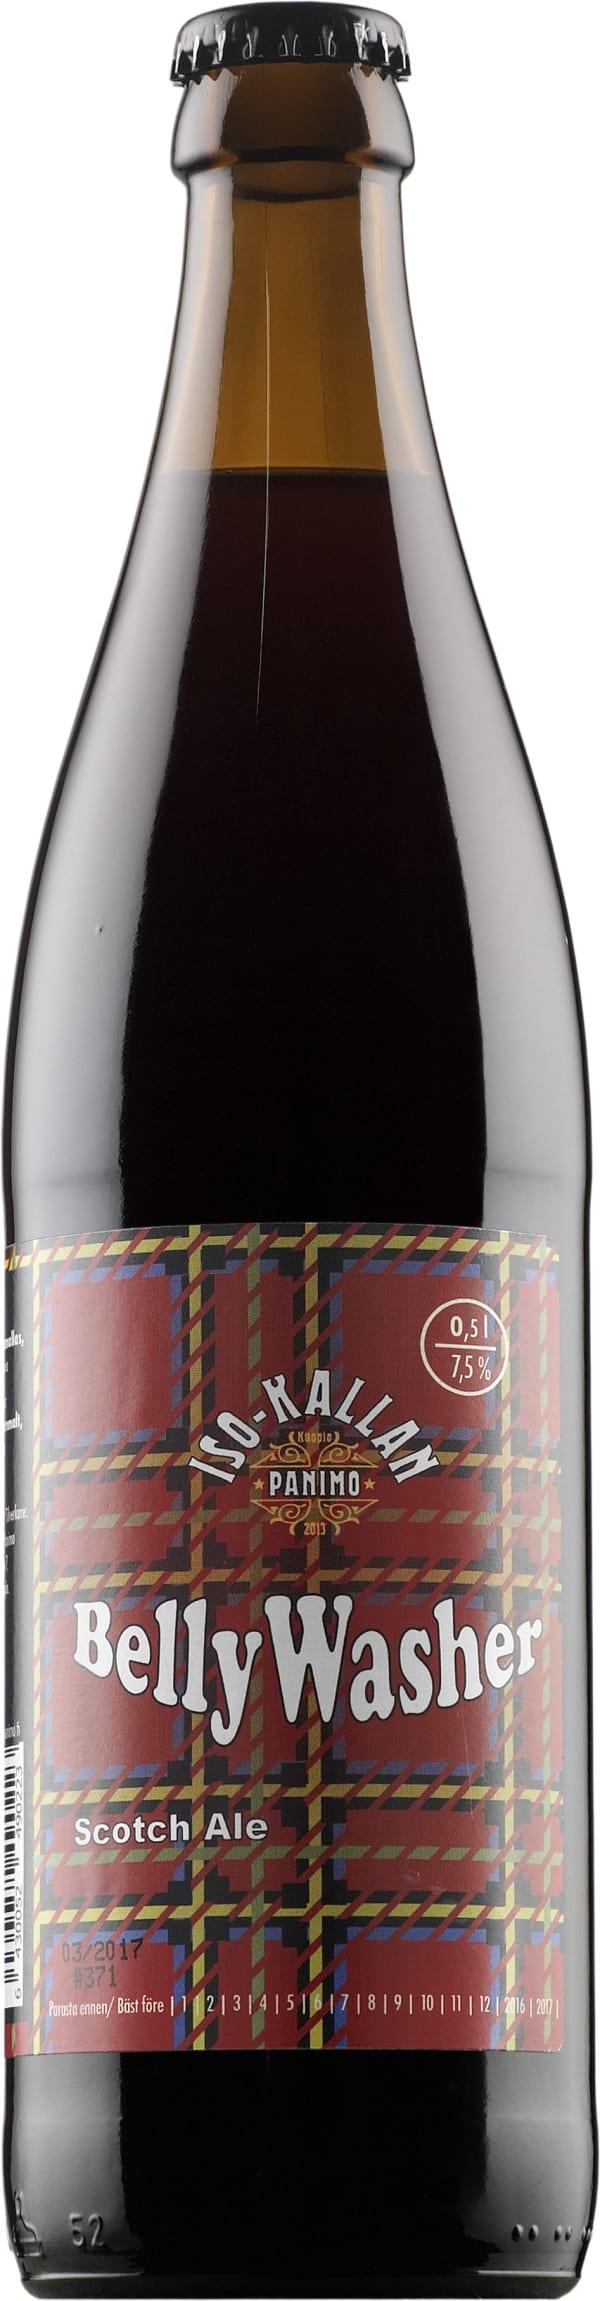 Iso-Kallan Bellywasher Scotch Ale